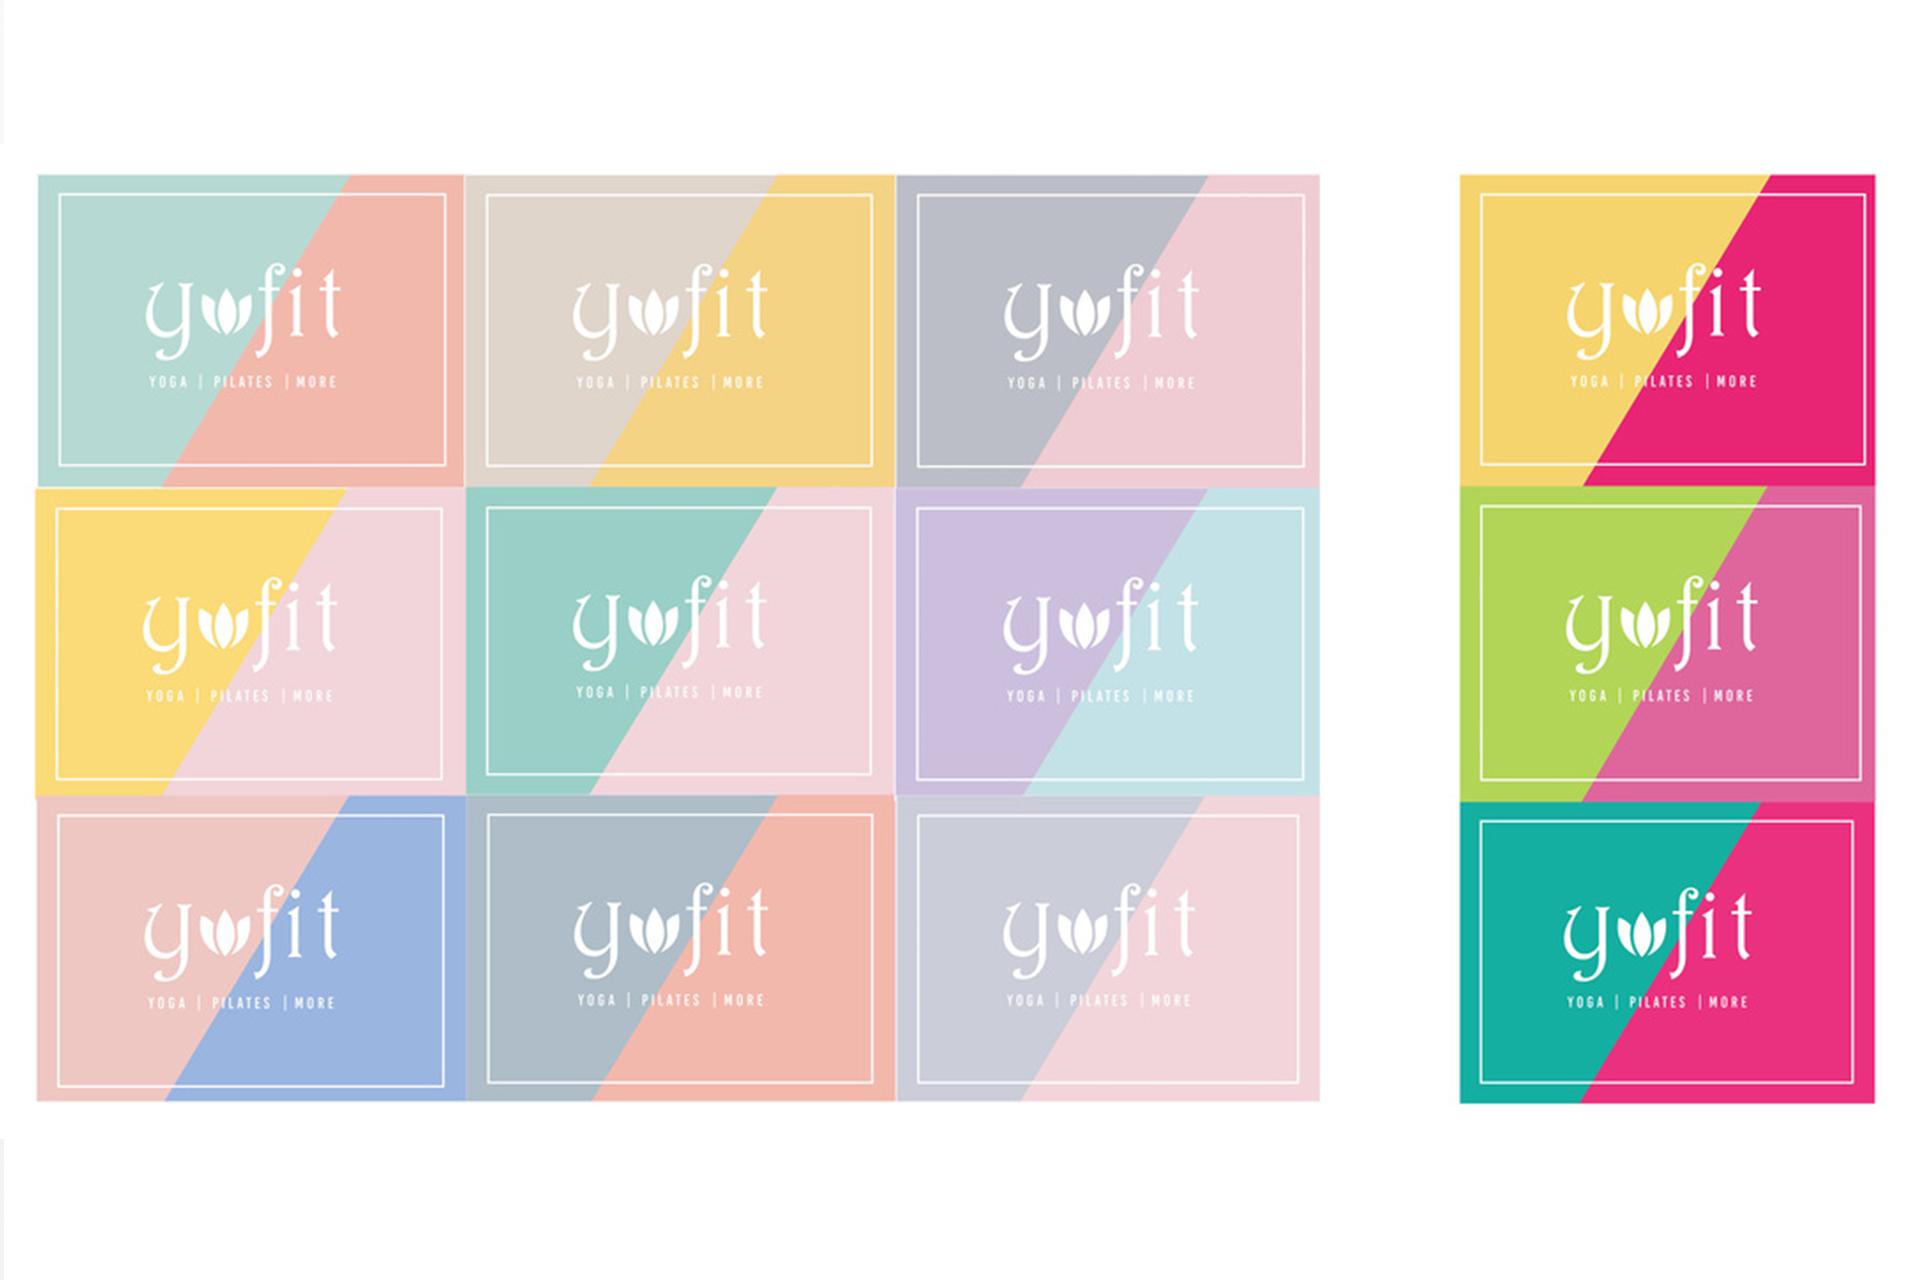 yofit04.jpg